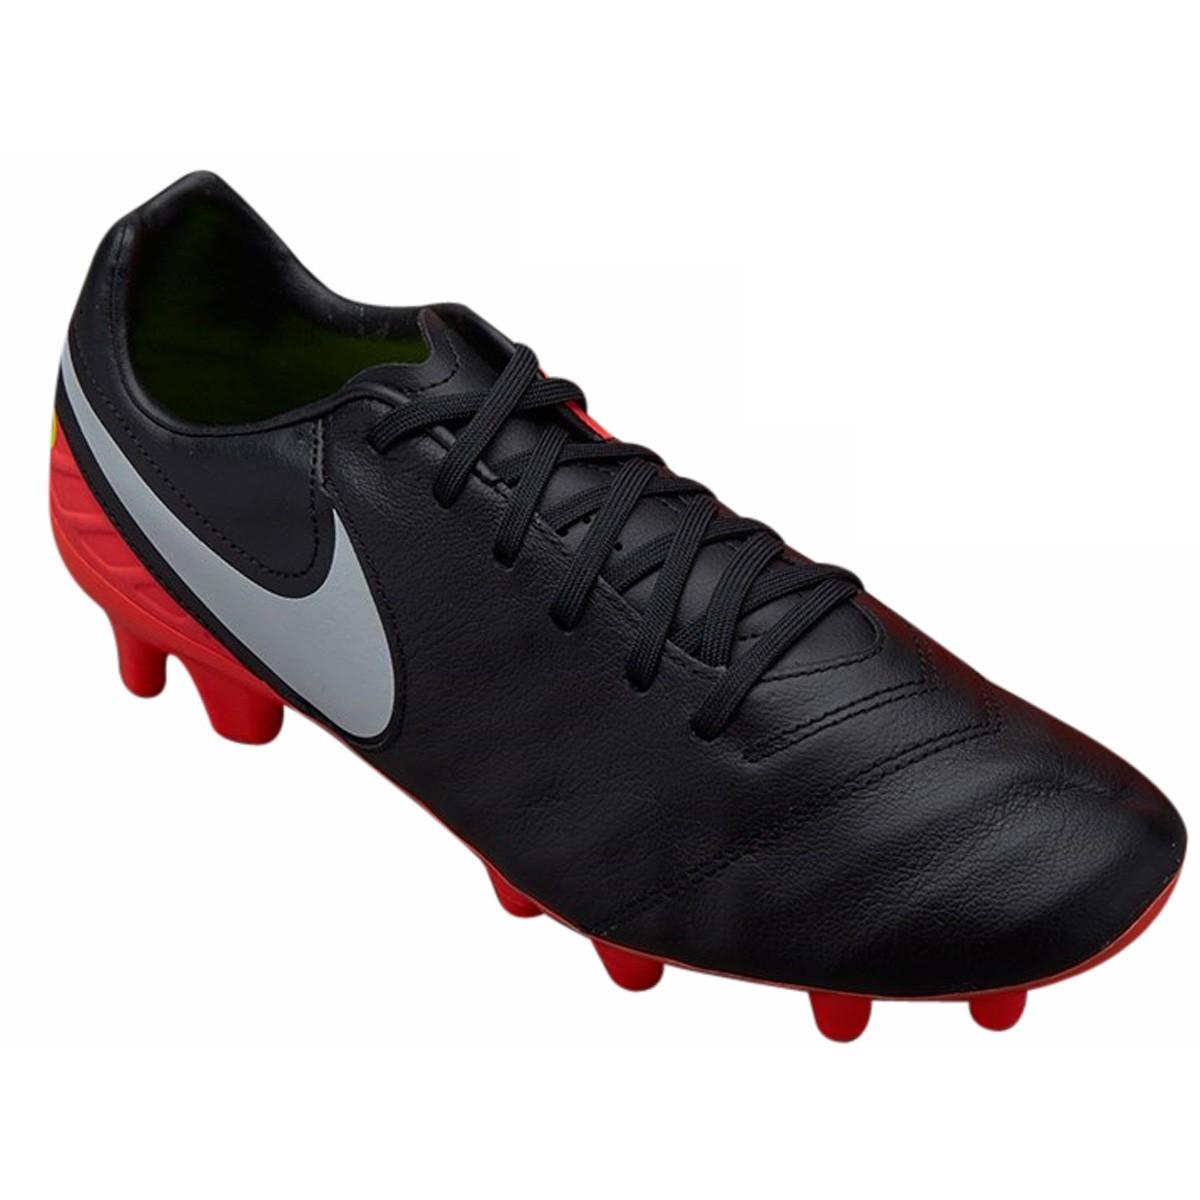 Chuteira Nike Campo Tiempo Mystic V FG 819236-018 - Preto Salmão ... 3eb286280d374